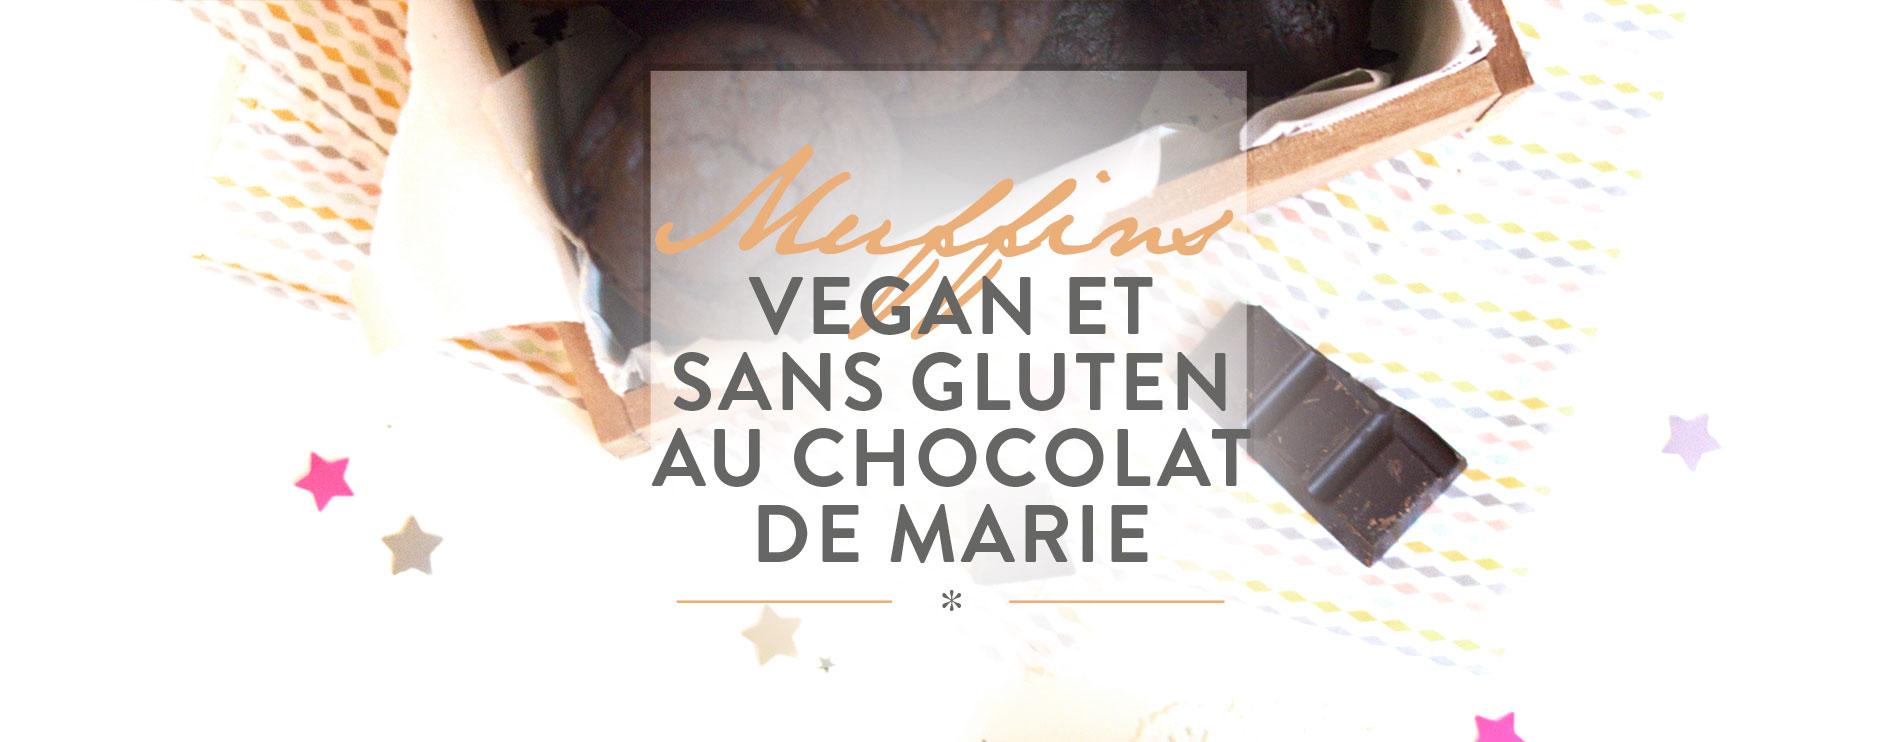 recette vegan, muffins vegan et sans gluten au chocolat de marie, muffins vegans